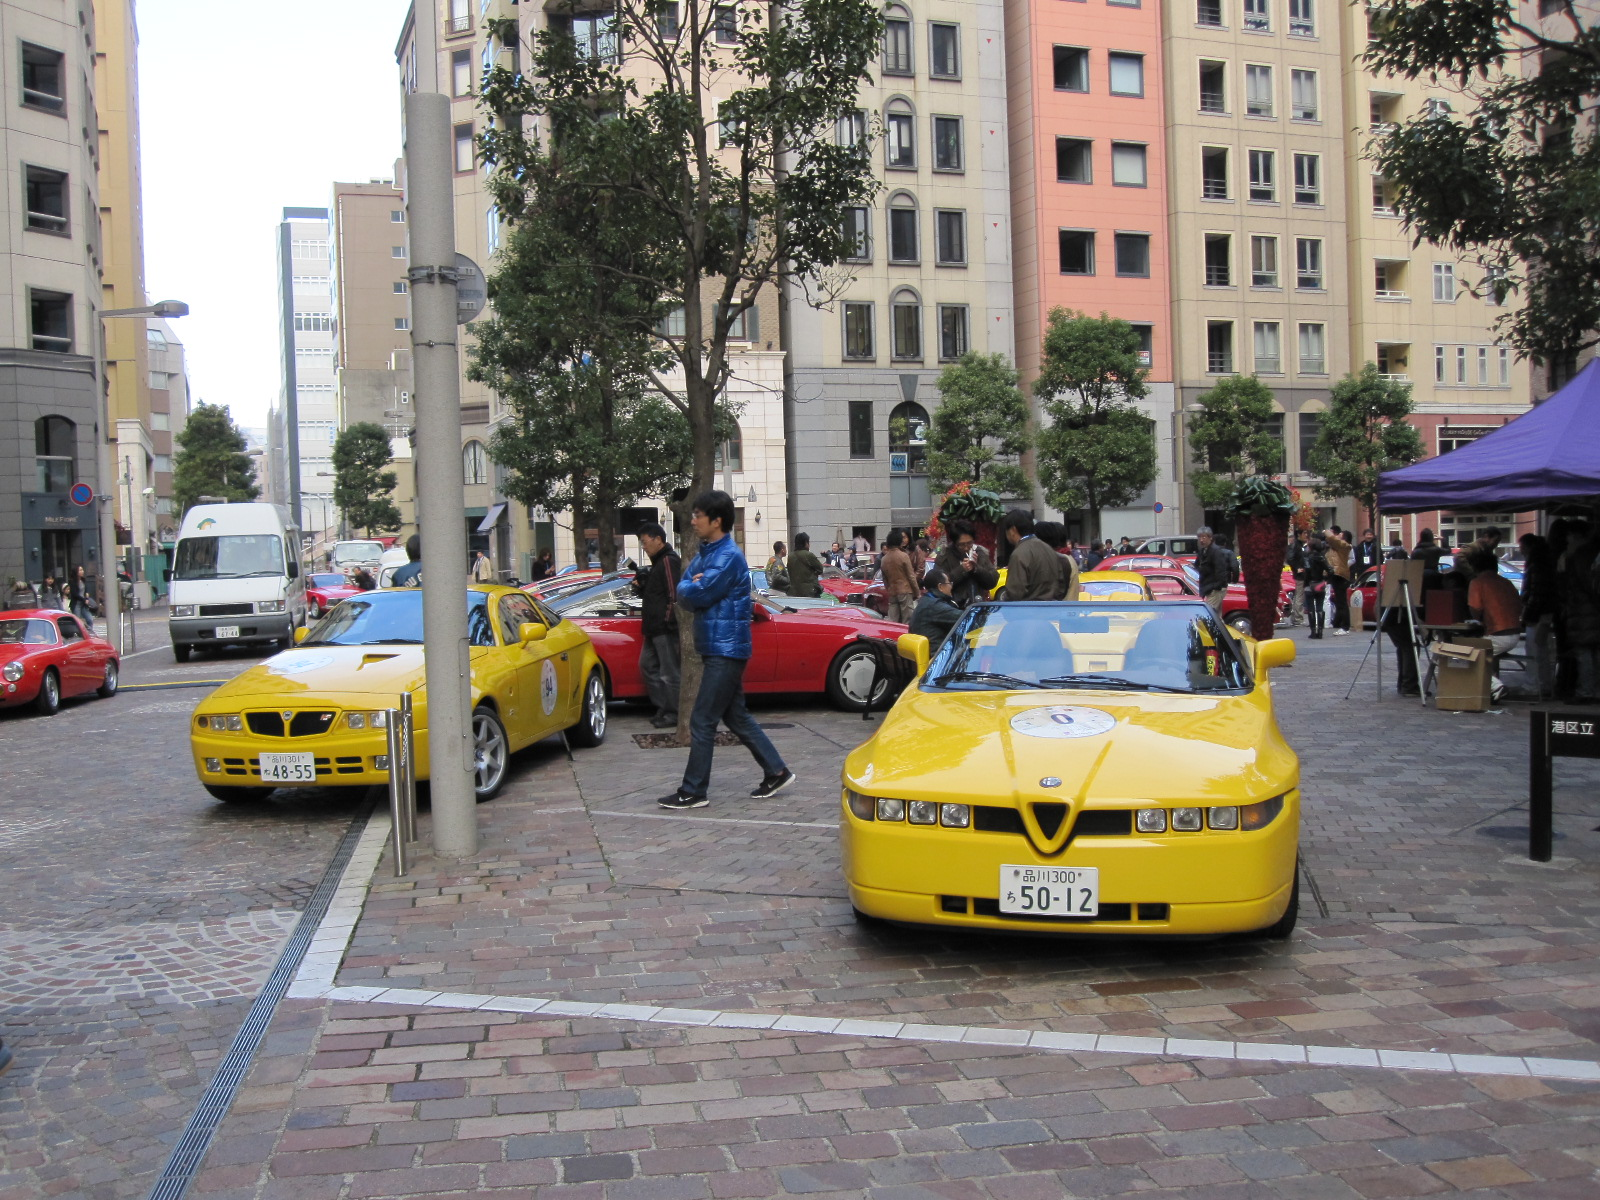 http://zagatoclub.jp/cars/IMG_2764.JPG